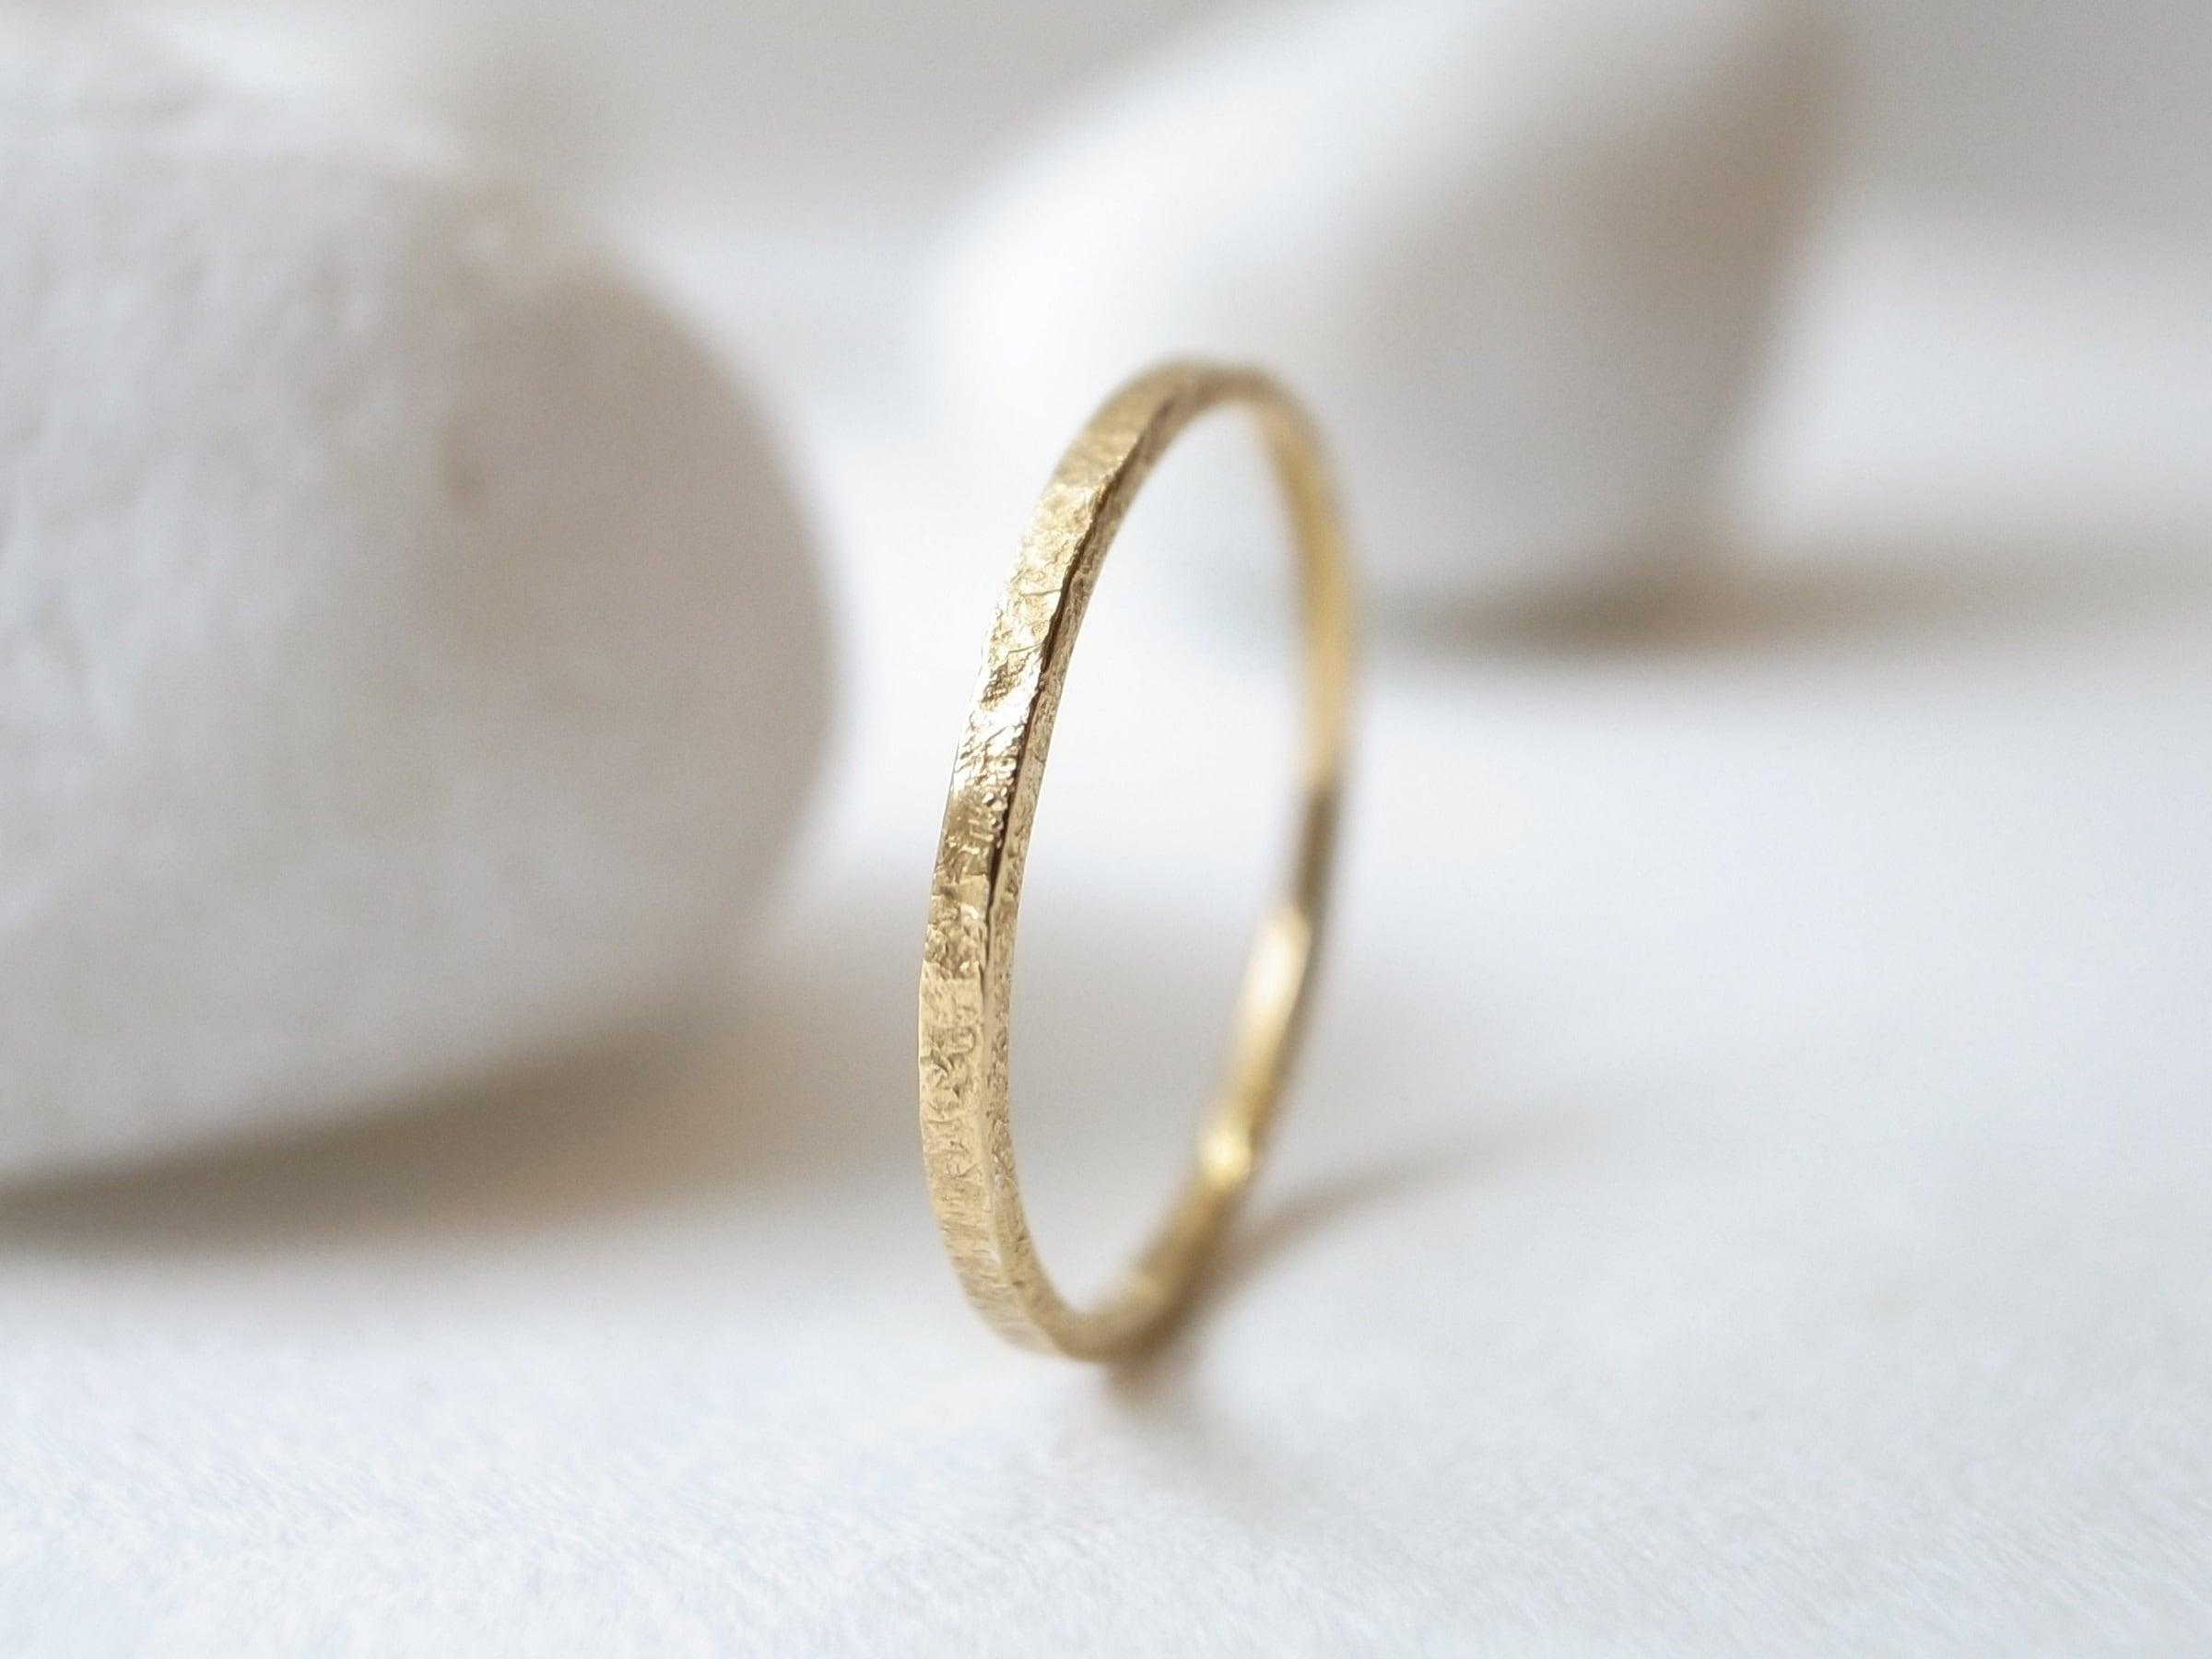 K18YG/stone texture ring